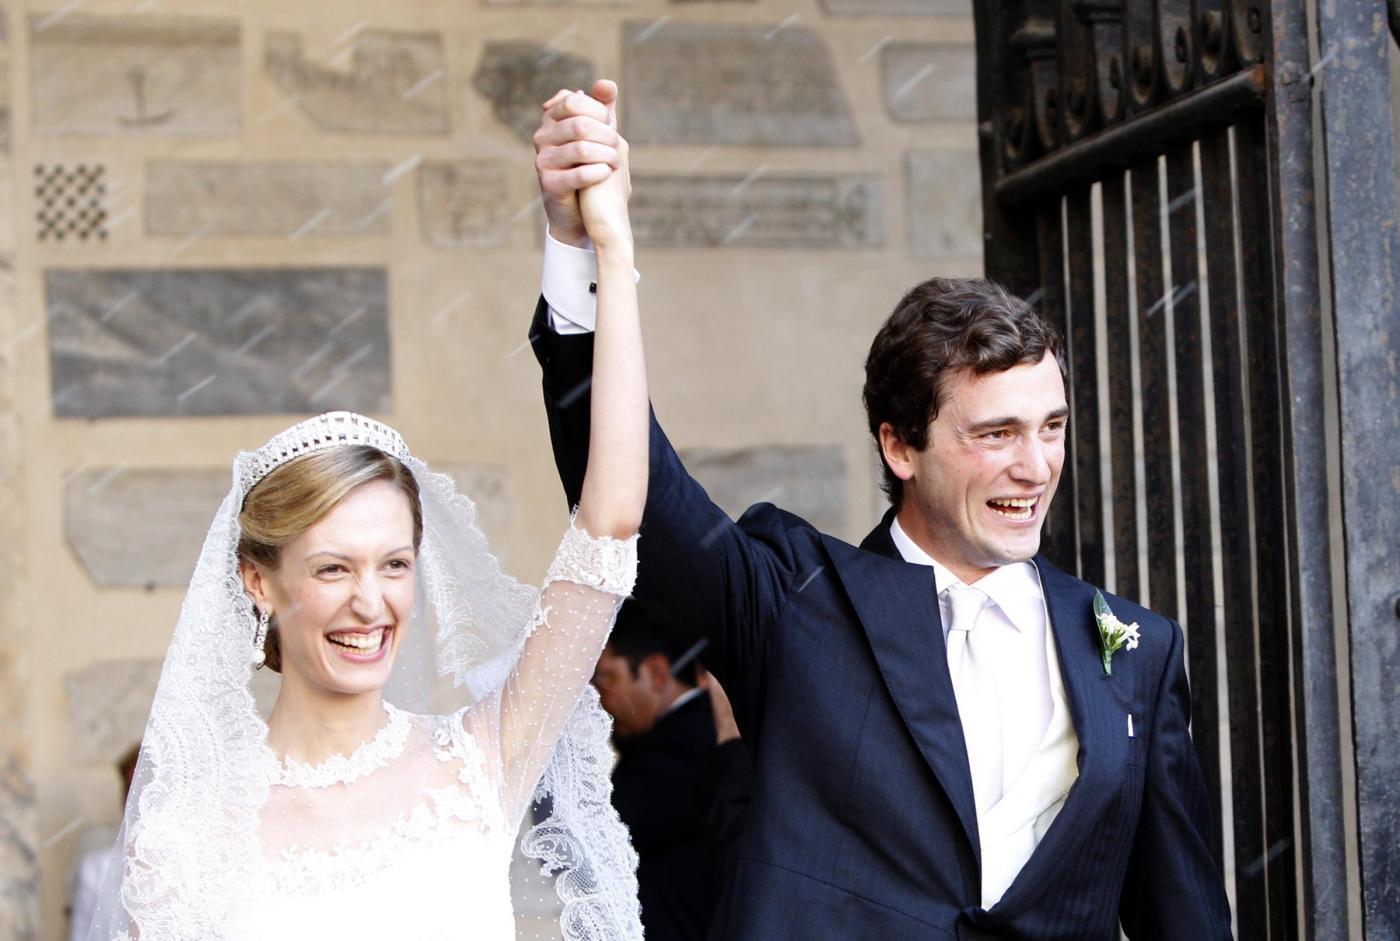 I reali del Belgio sposi a Roma: nozze italiane per Amedeo d'Asburgo-Este ed Elisabetta Rosboch Von Wolkenstein